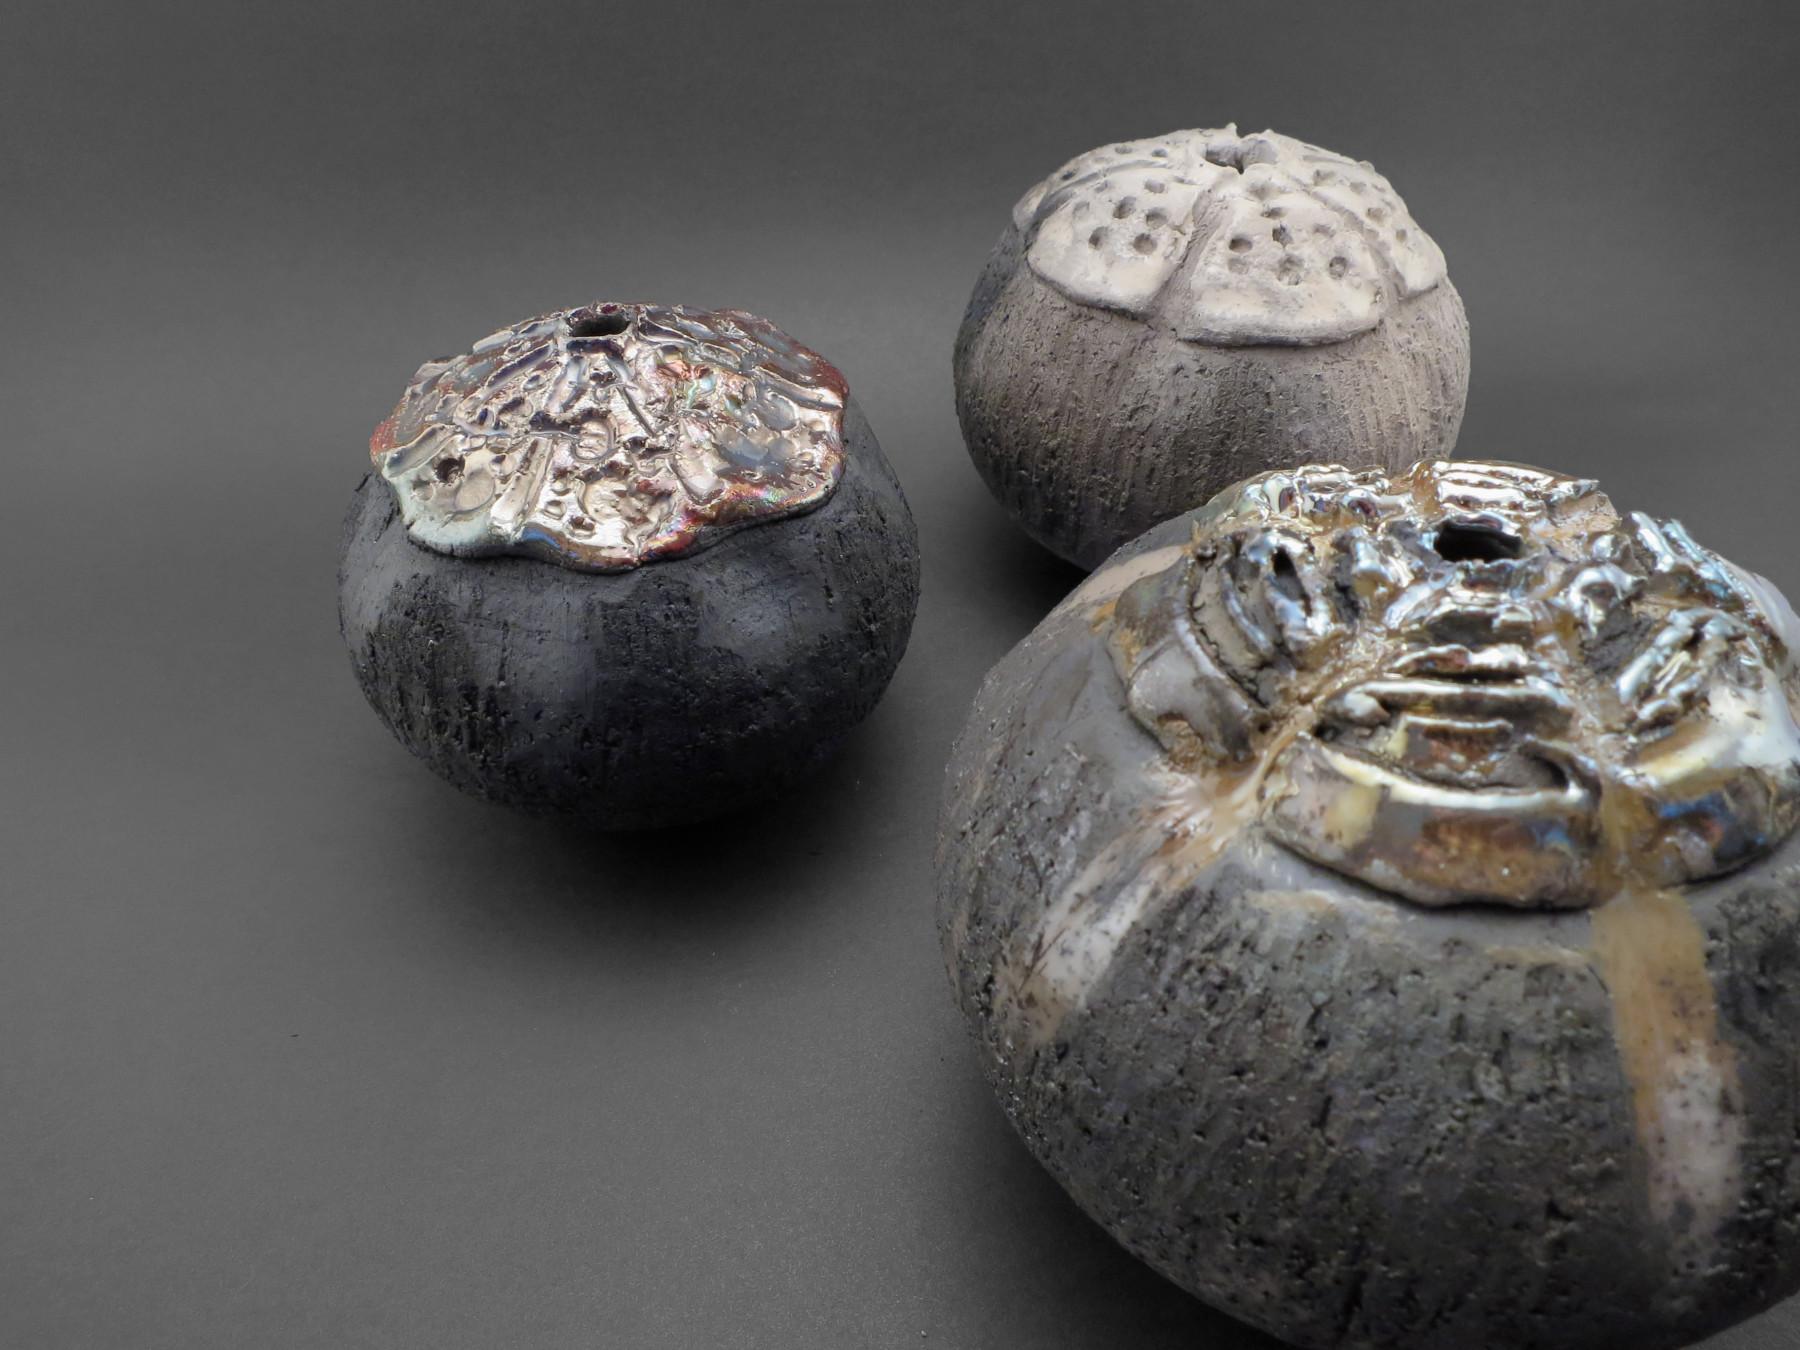 Sea Critters: Whispering Globes - Ildikó Károlyi